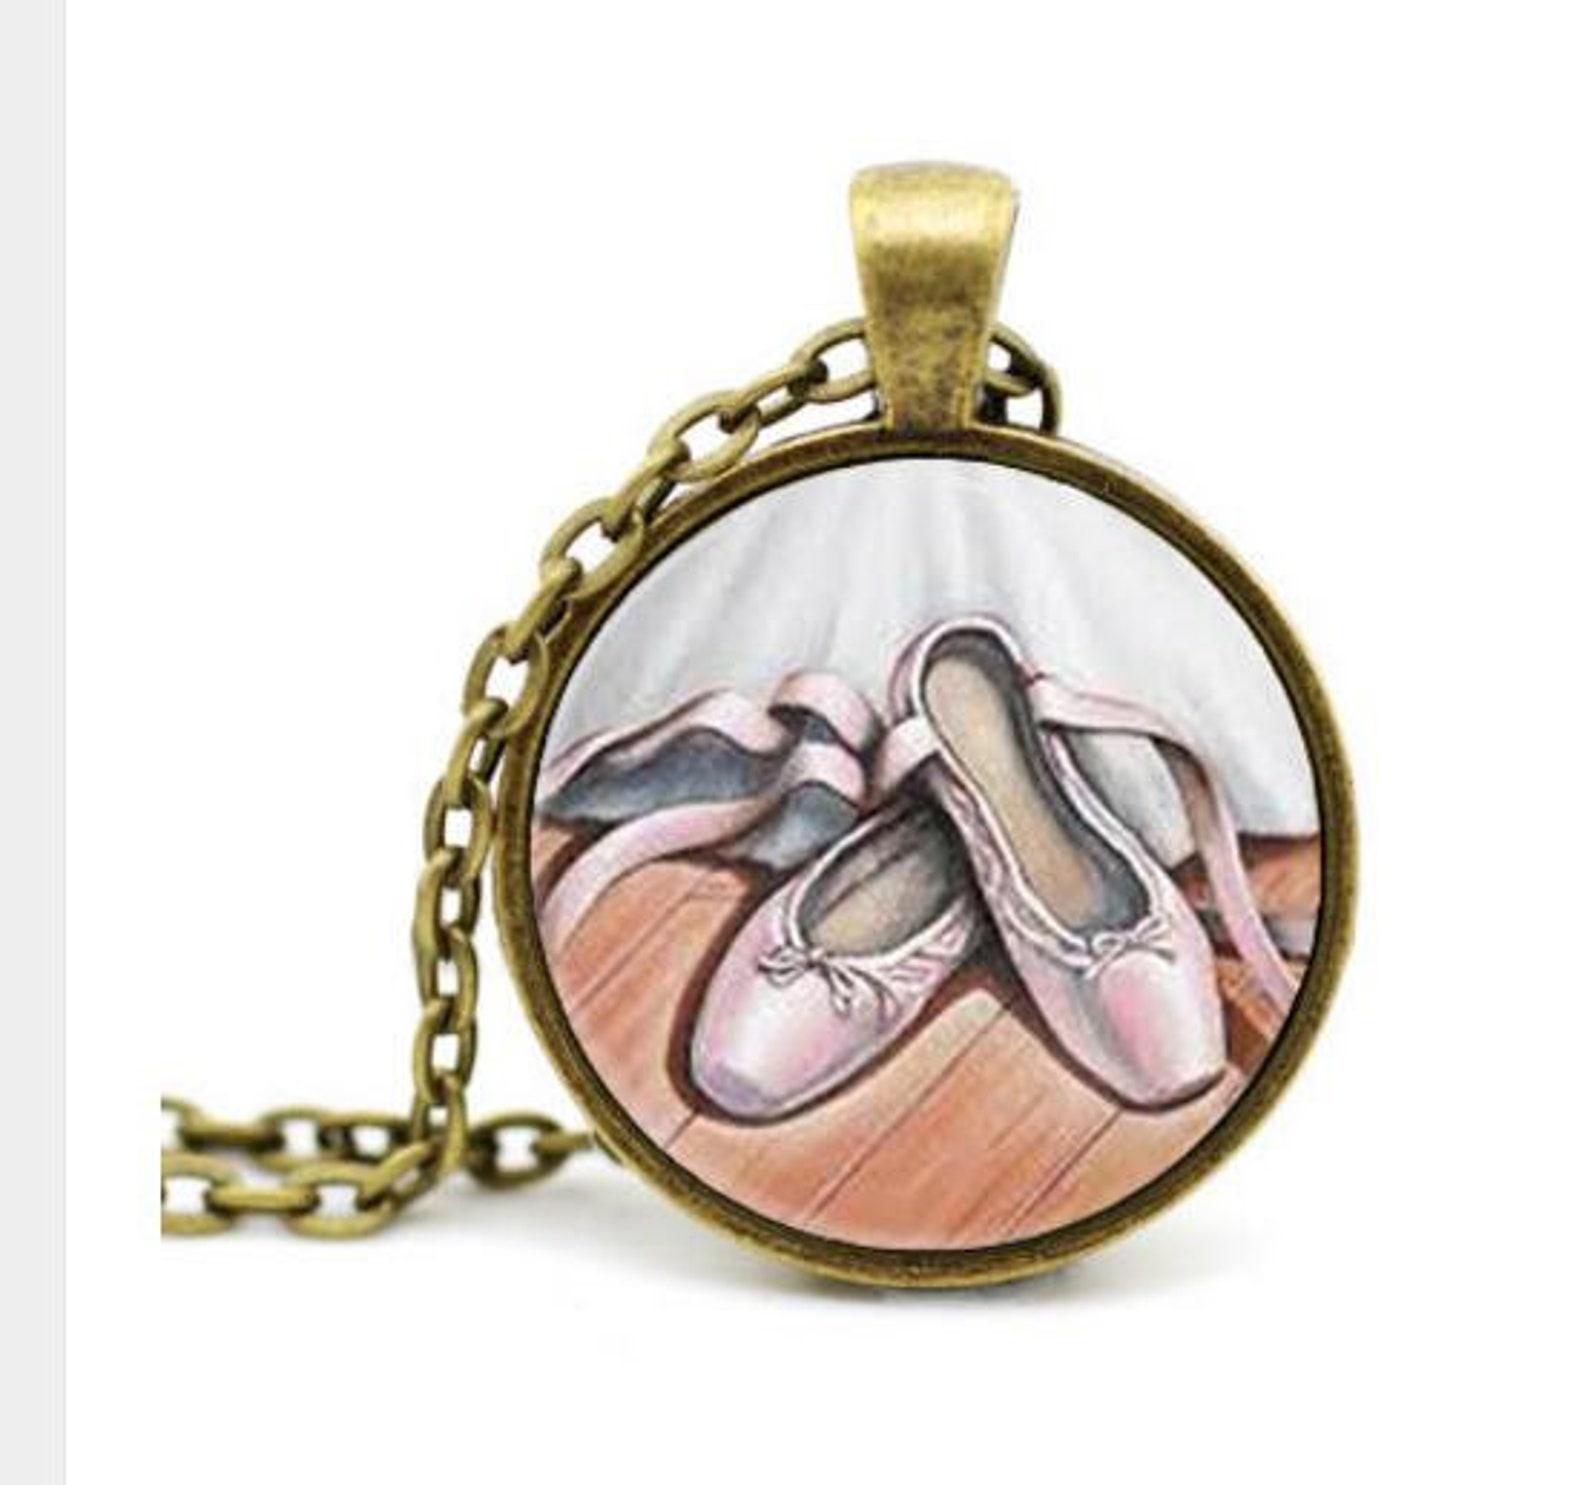 ballet necklace - ballet shoes necklace - ballet jewelry - ballet pendant - ballerina shoes necklace - ballerina shoes pendant